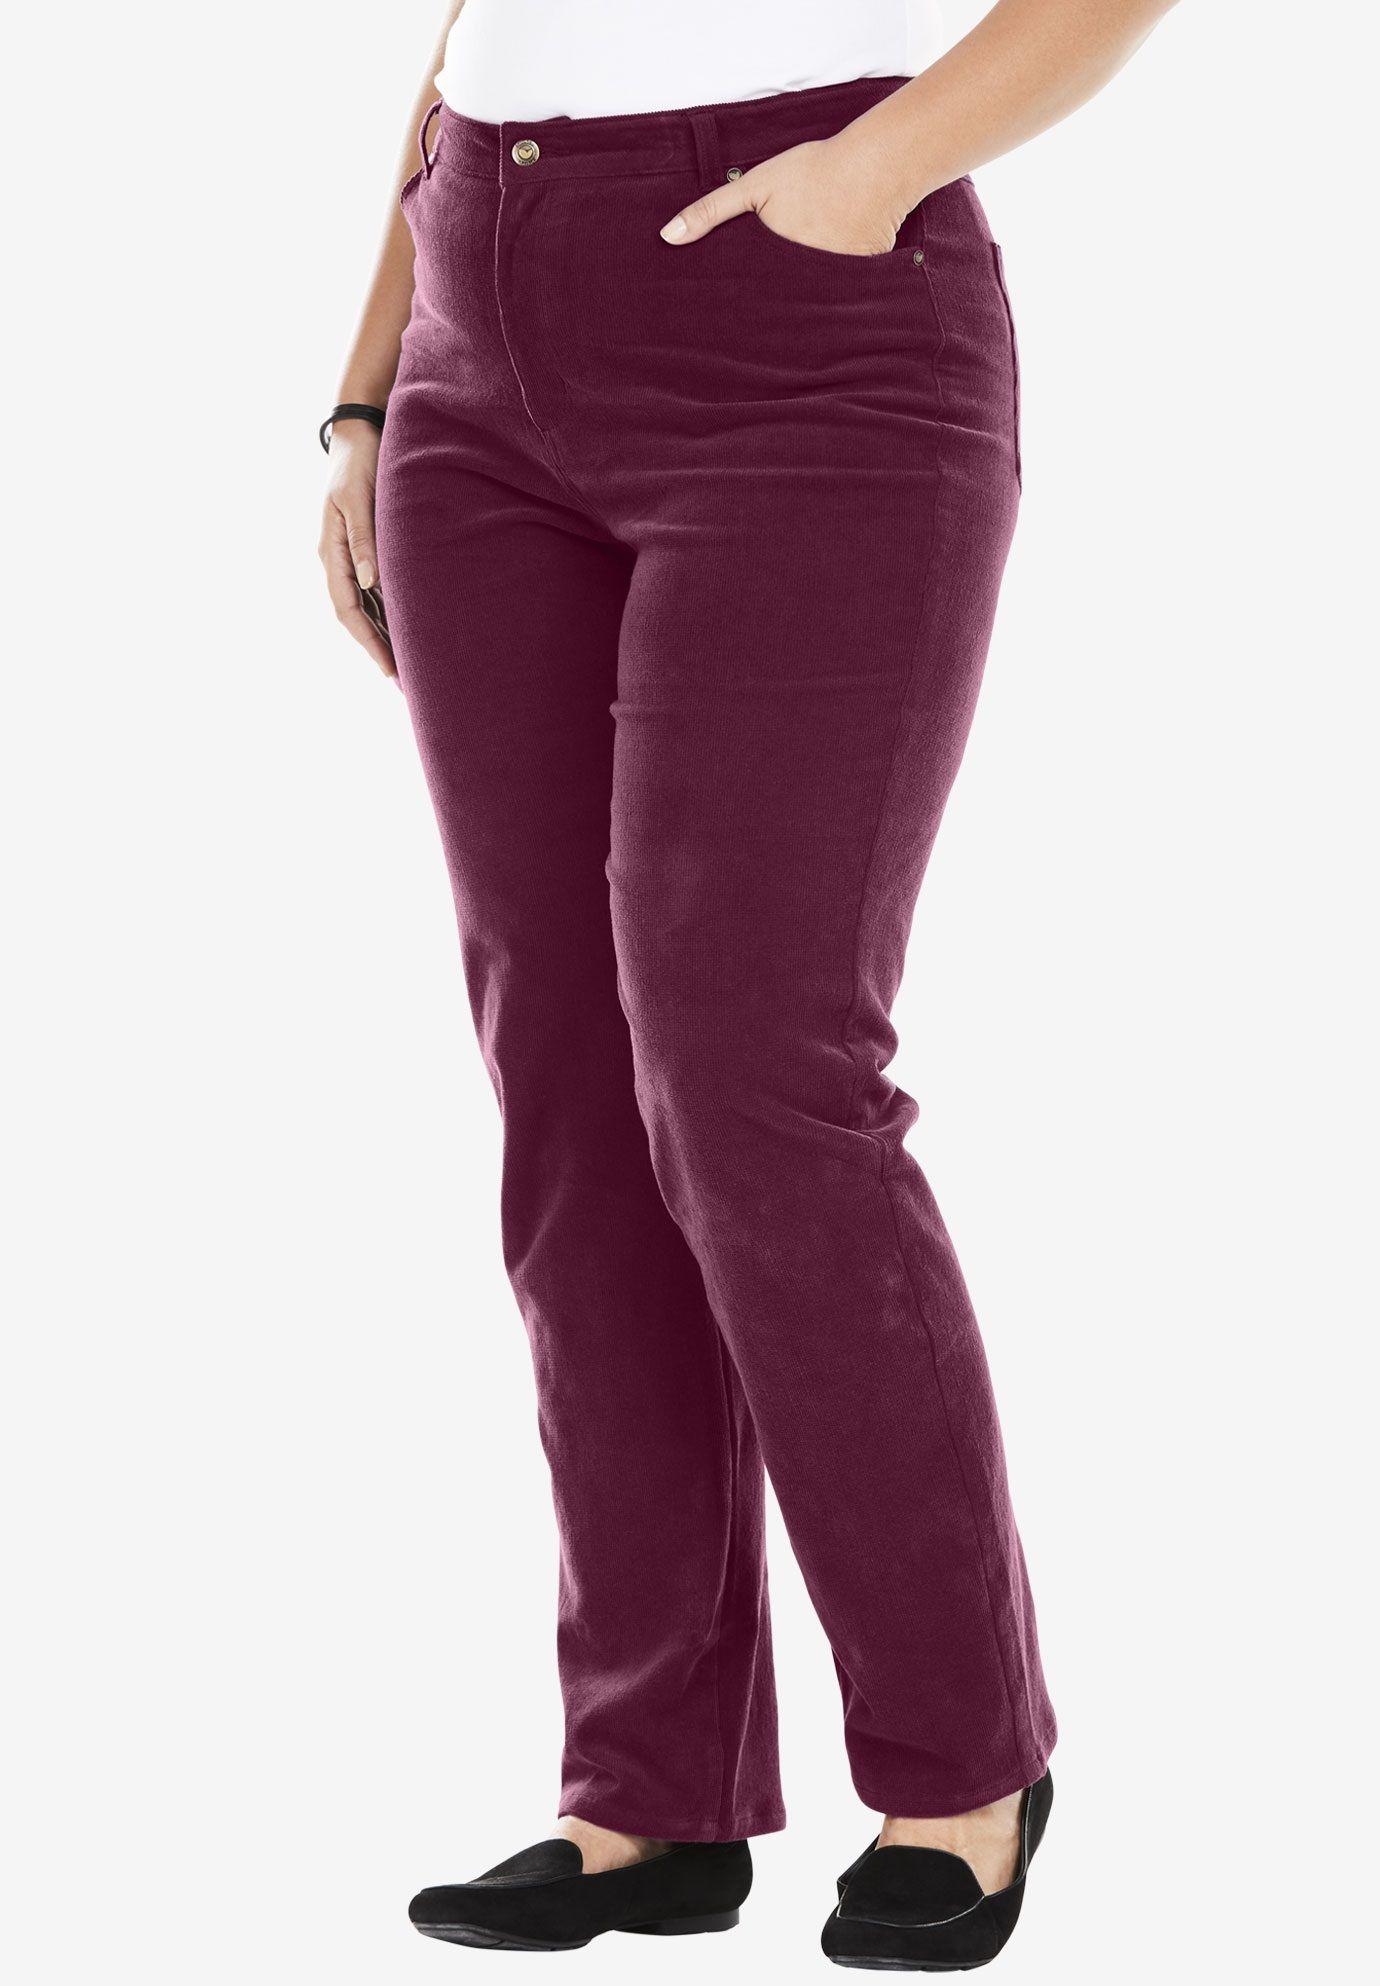 b79bd88ed77 Corduroy Straight Leg Stretch Pant - Women's Plus Size Clothing ...